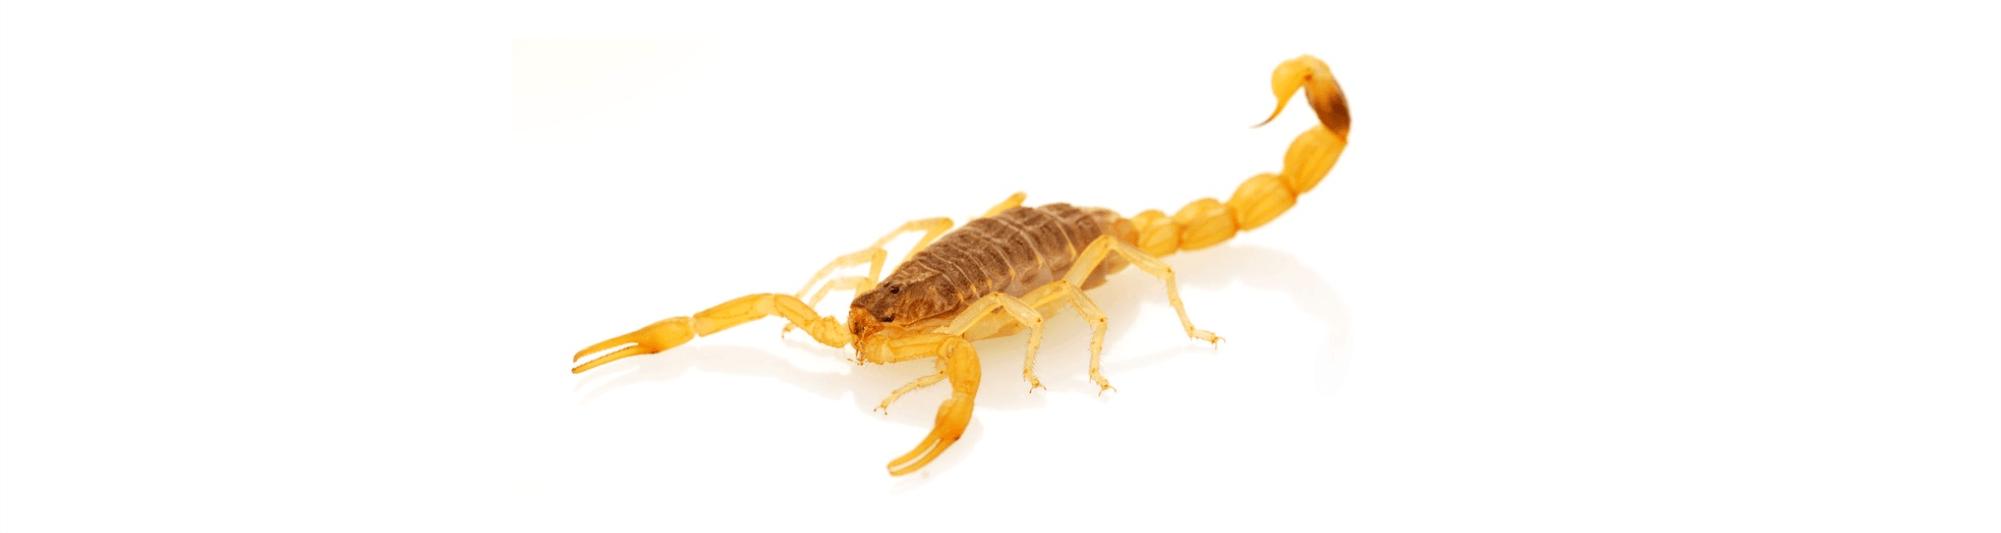 escorpiao